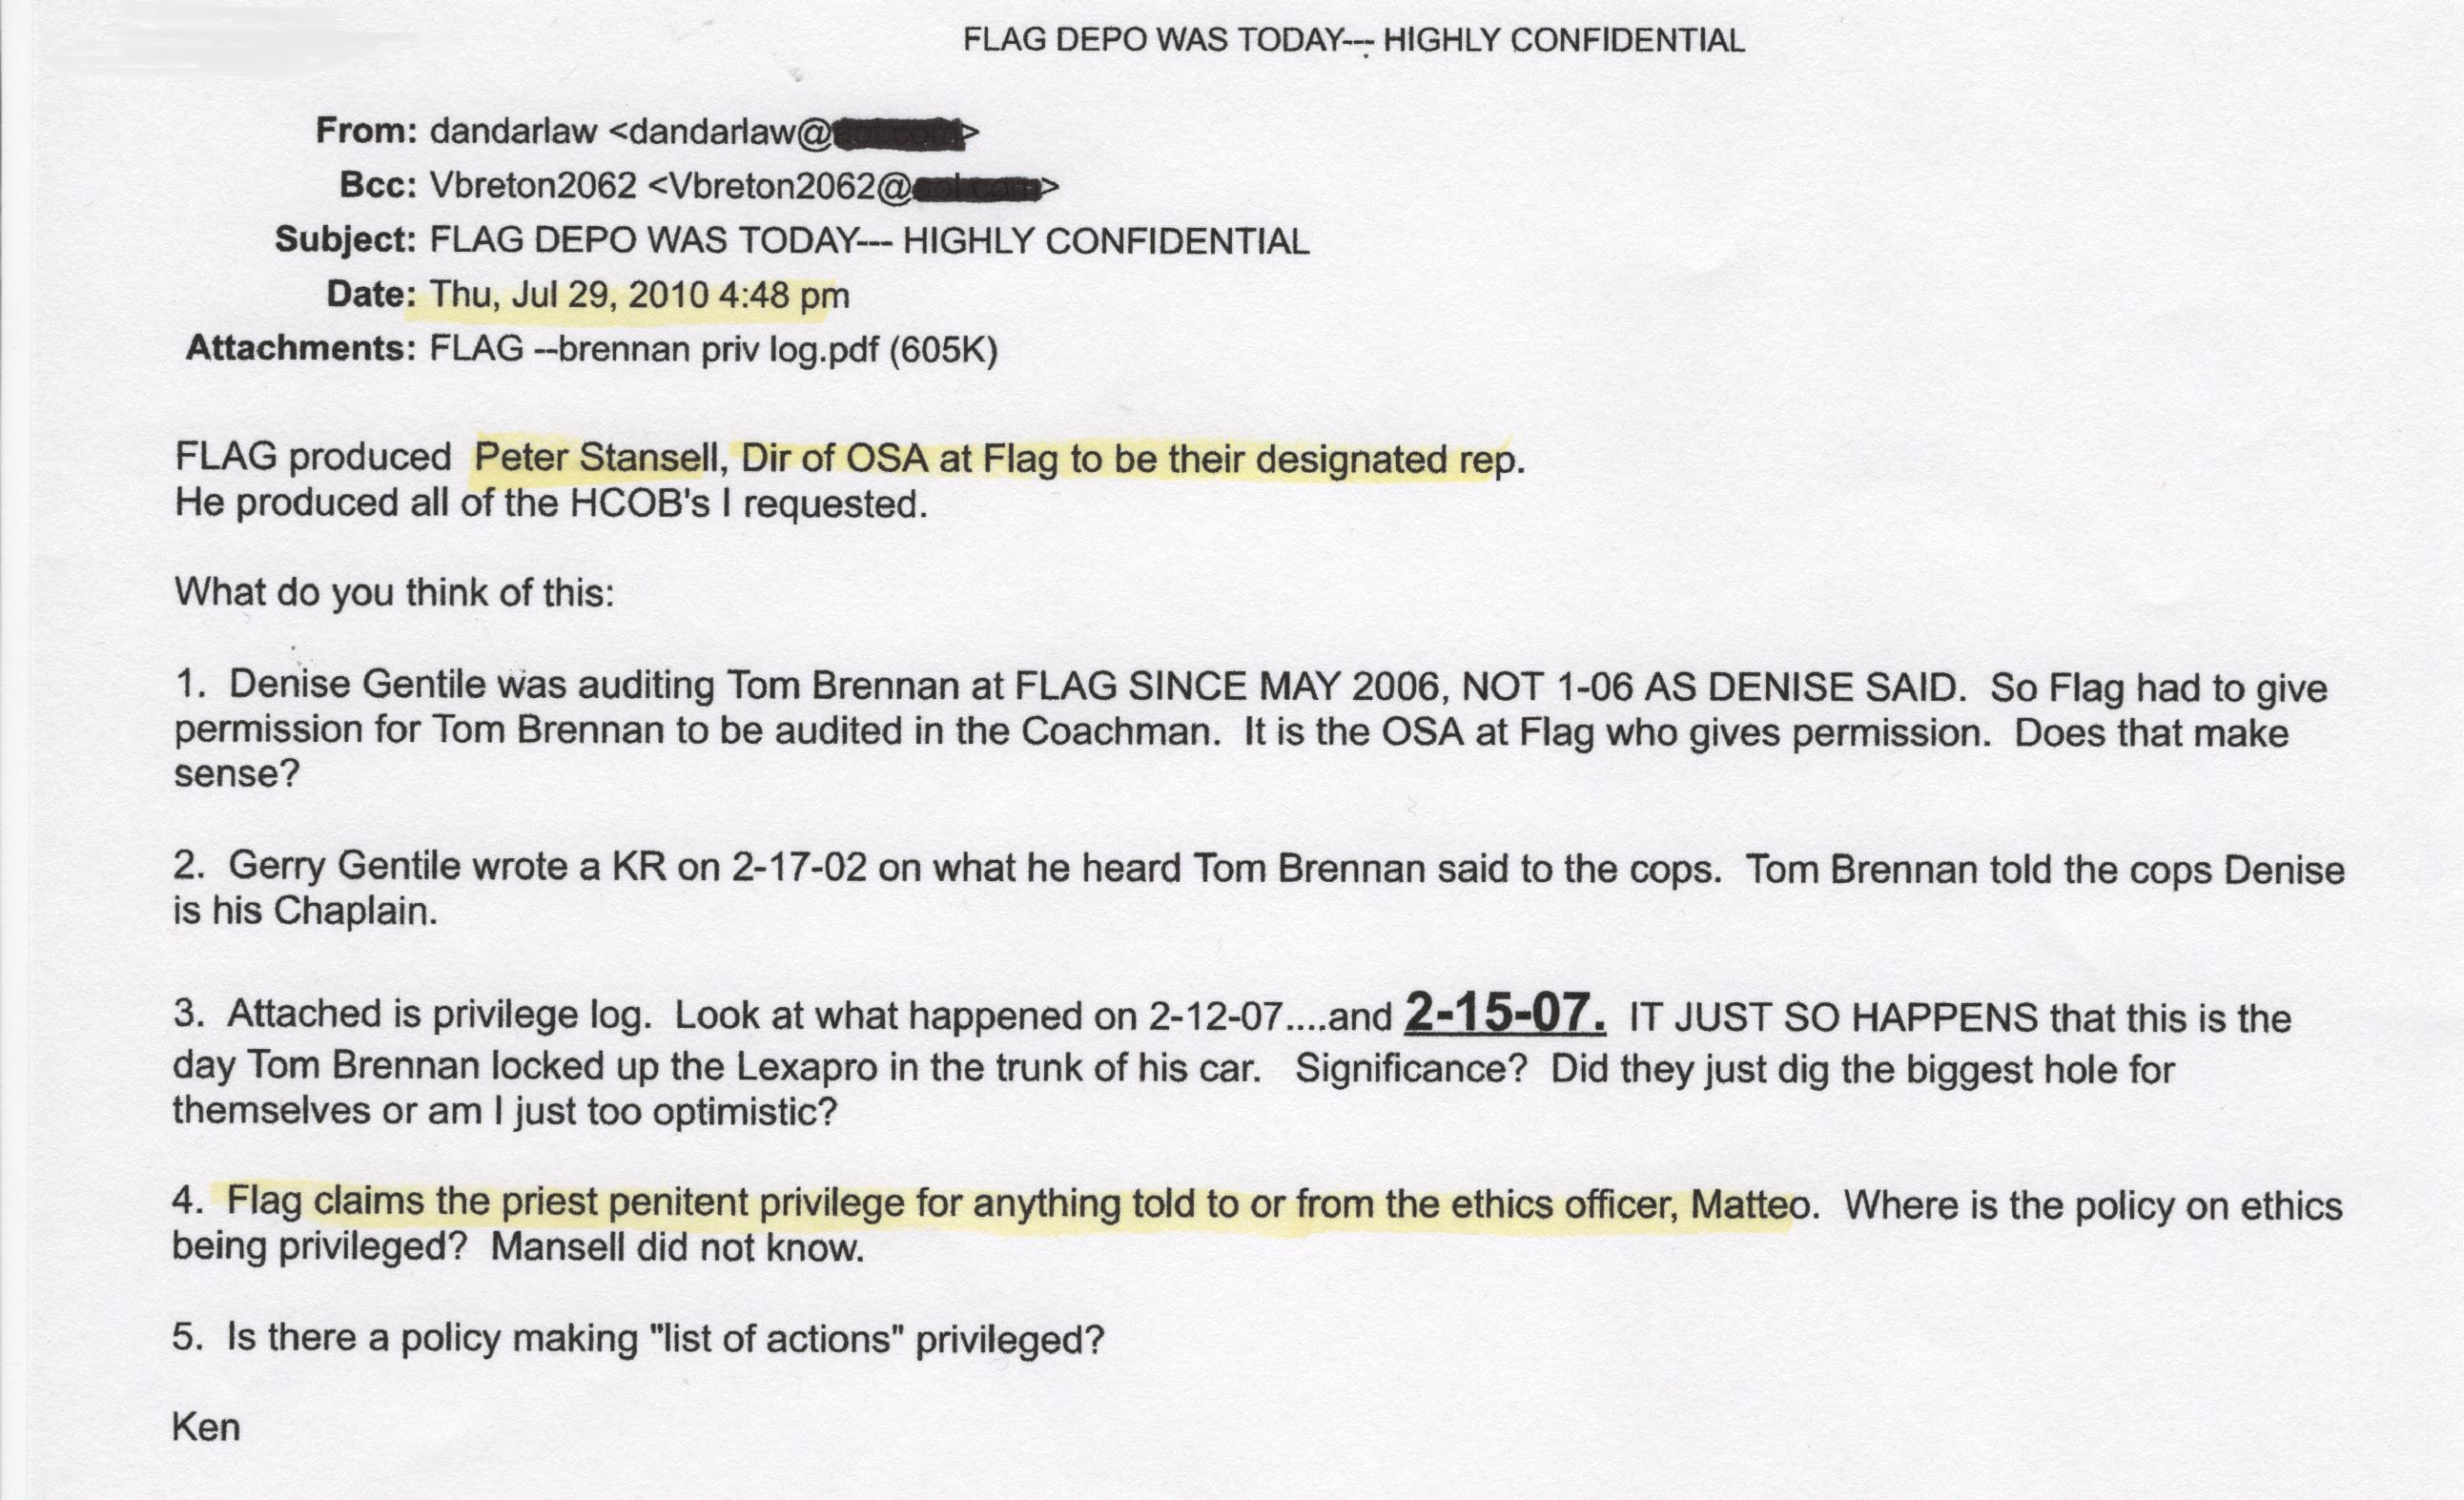 Flag Depo Today, Kyle Brennan, Scientology 001